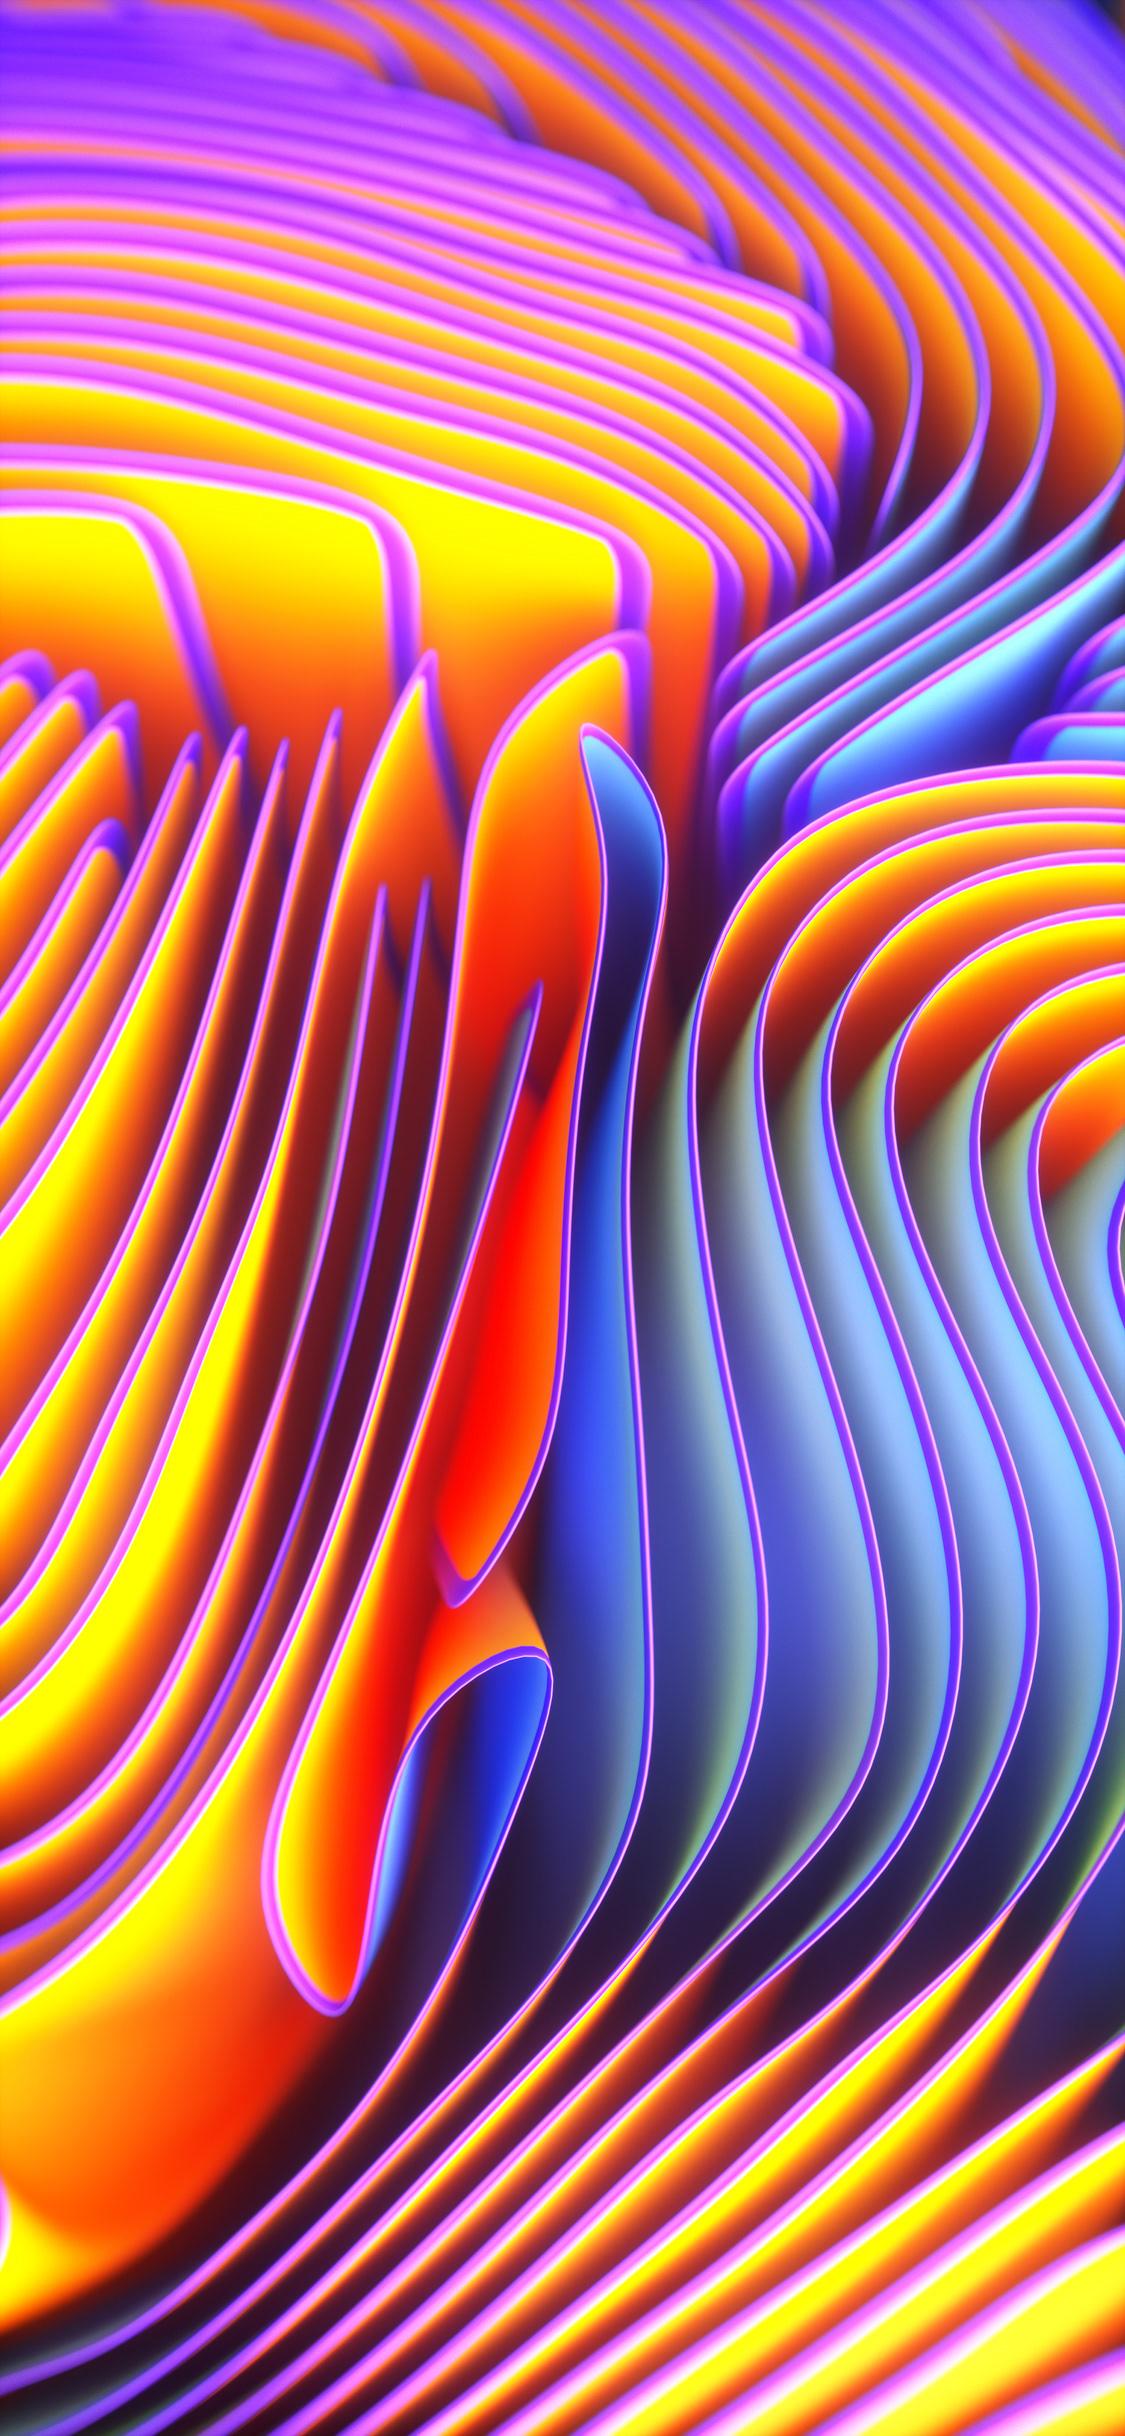 Twirl_02_02_02_02-1